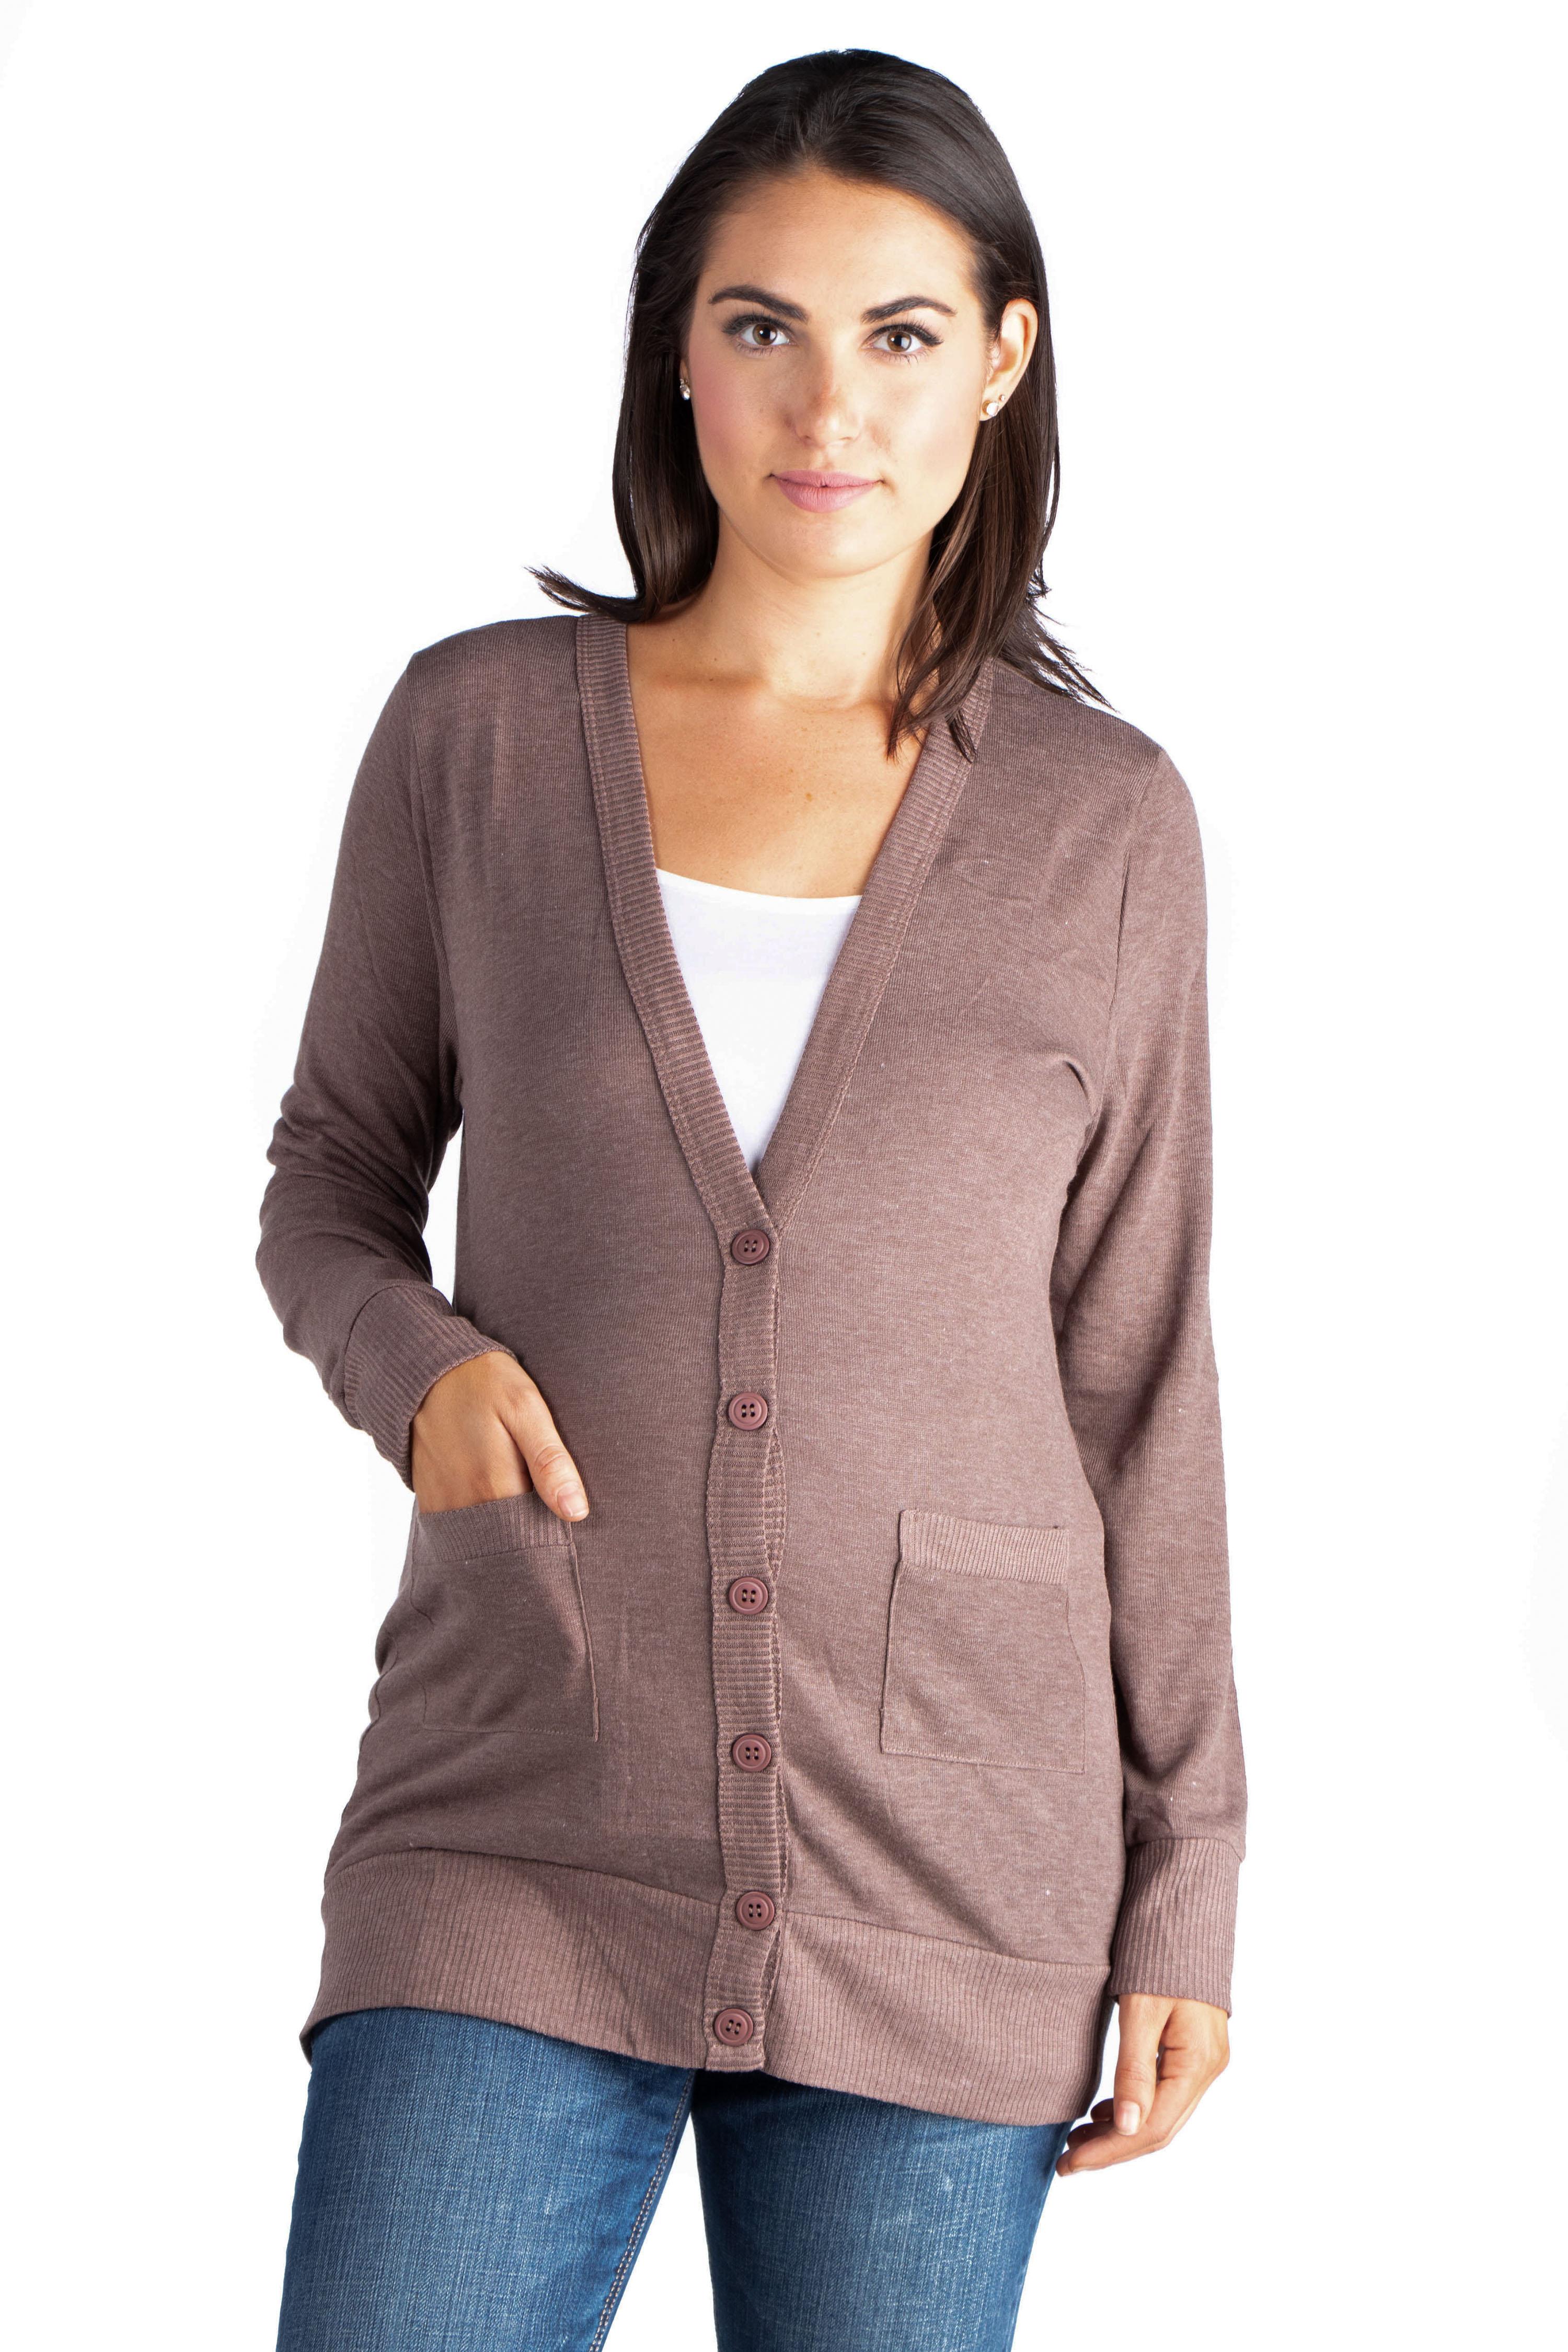 24seven Comfort Apparel Casual Comfort V-neck Maternity Pocket Cardigan